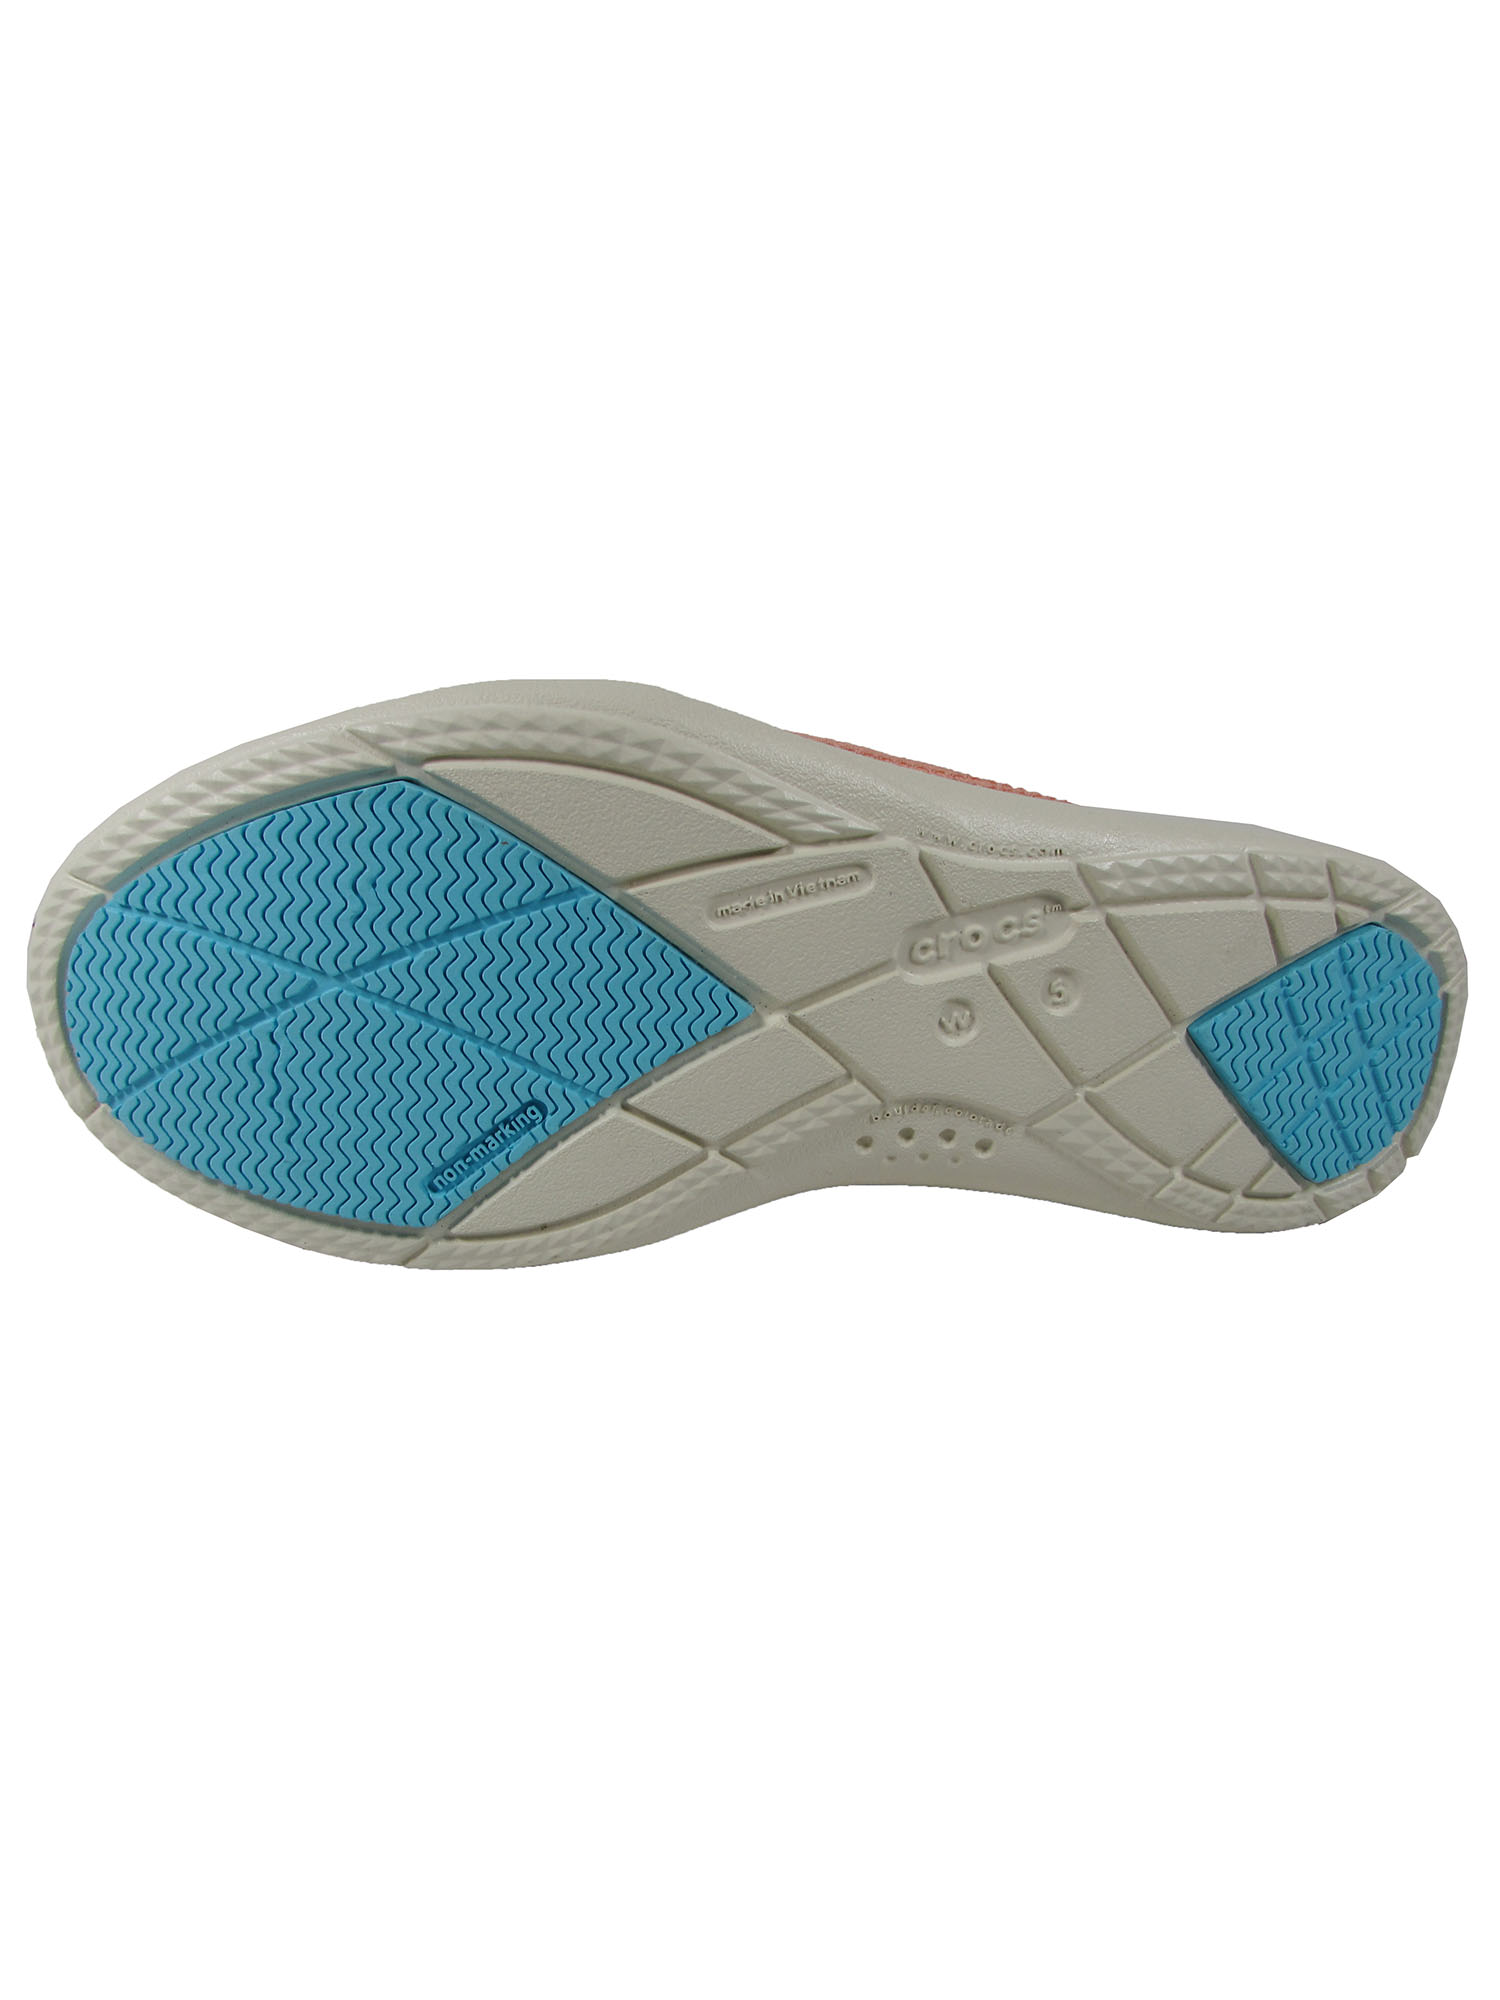 Crocs-Womens-Walu-Canvas-Loafer-Slip-On-Shoe thumbnail 18